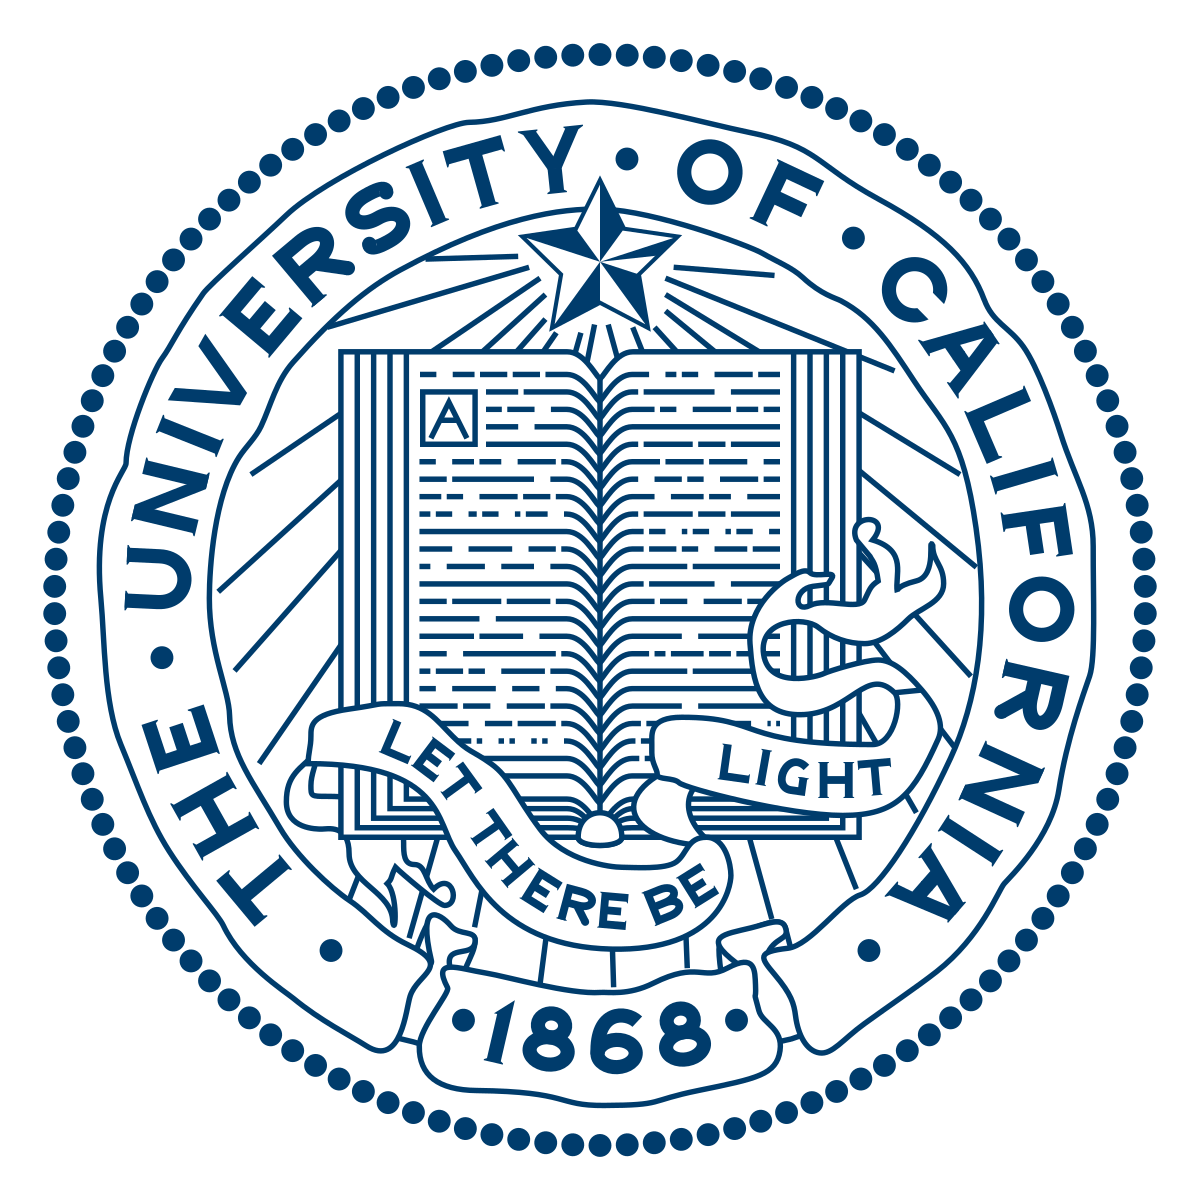 University of California, Santa Cruz.